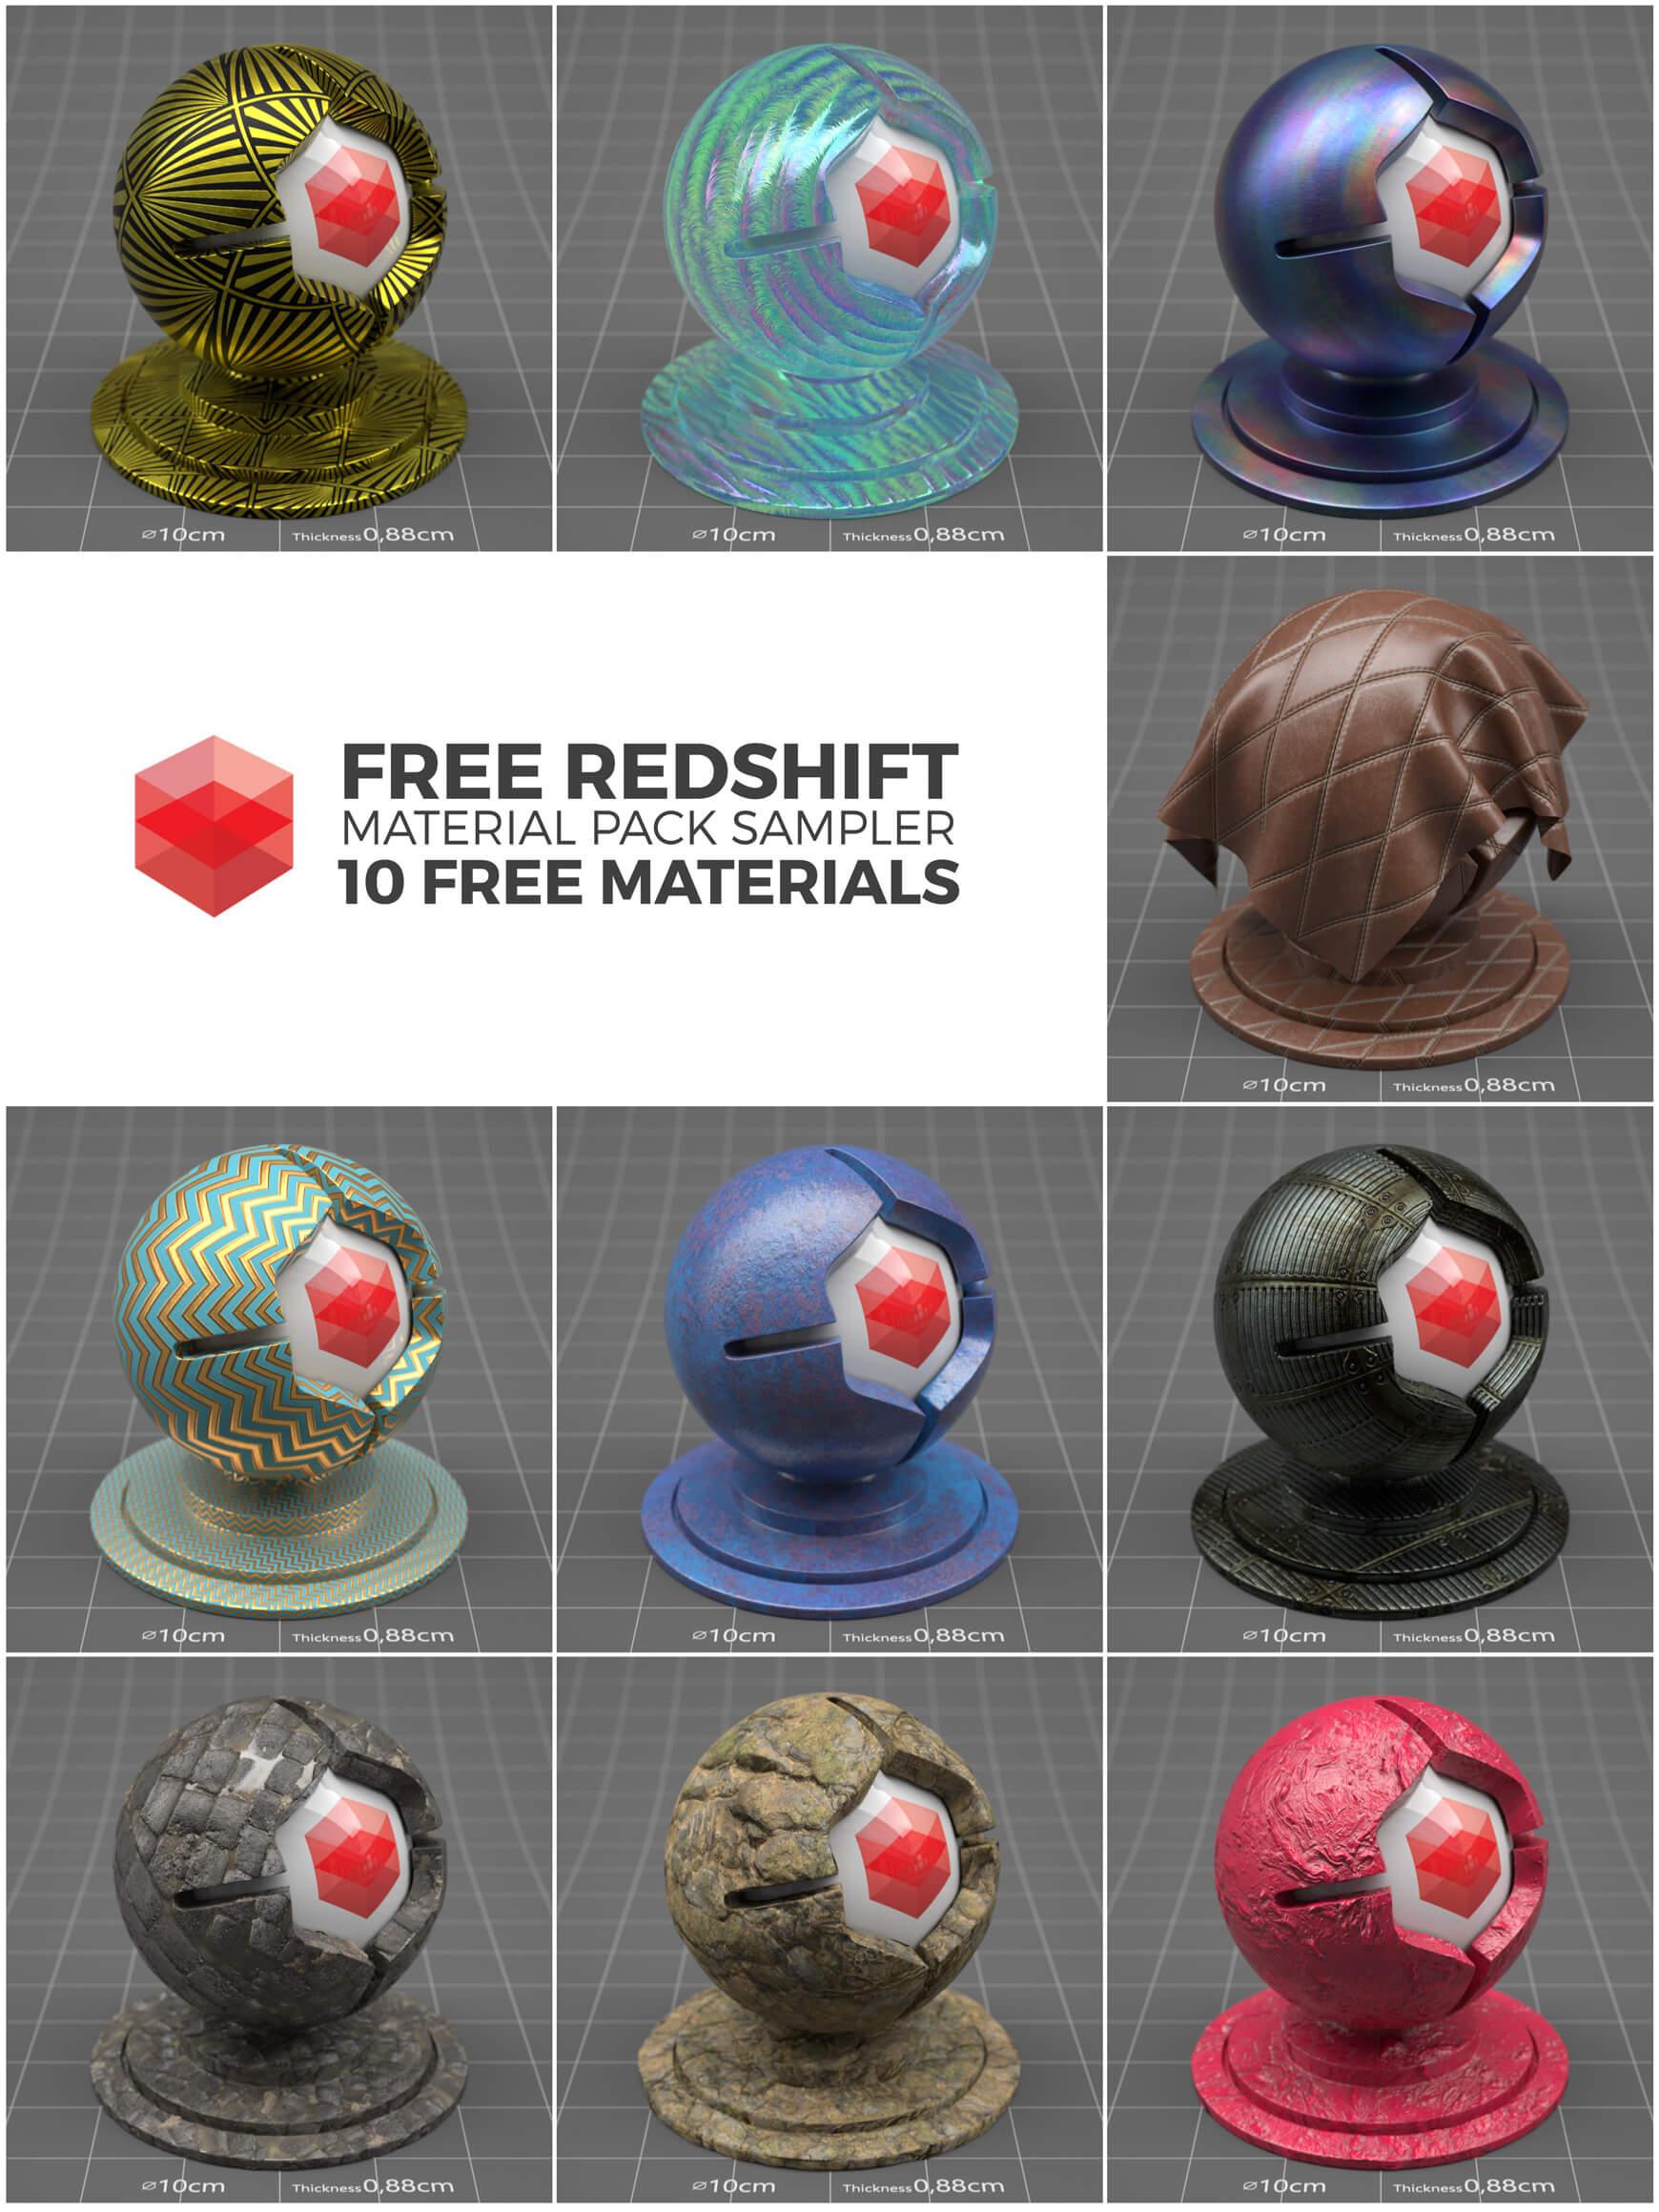 redshift sampler pack